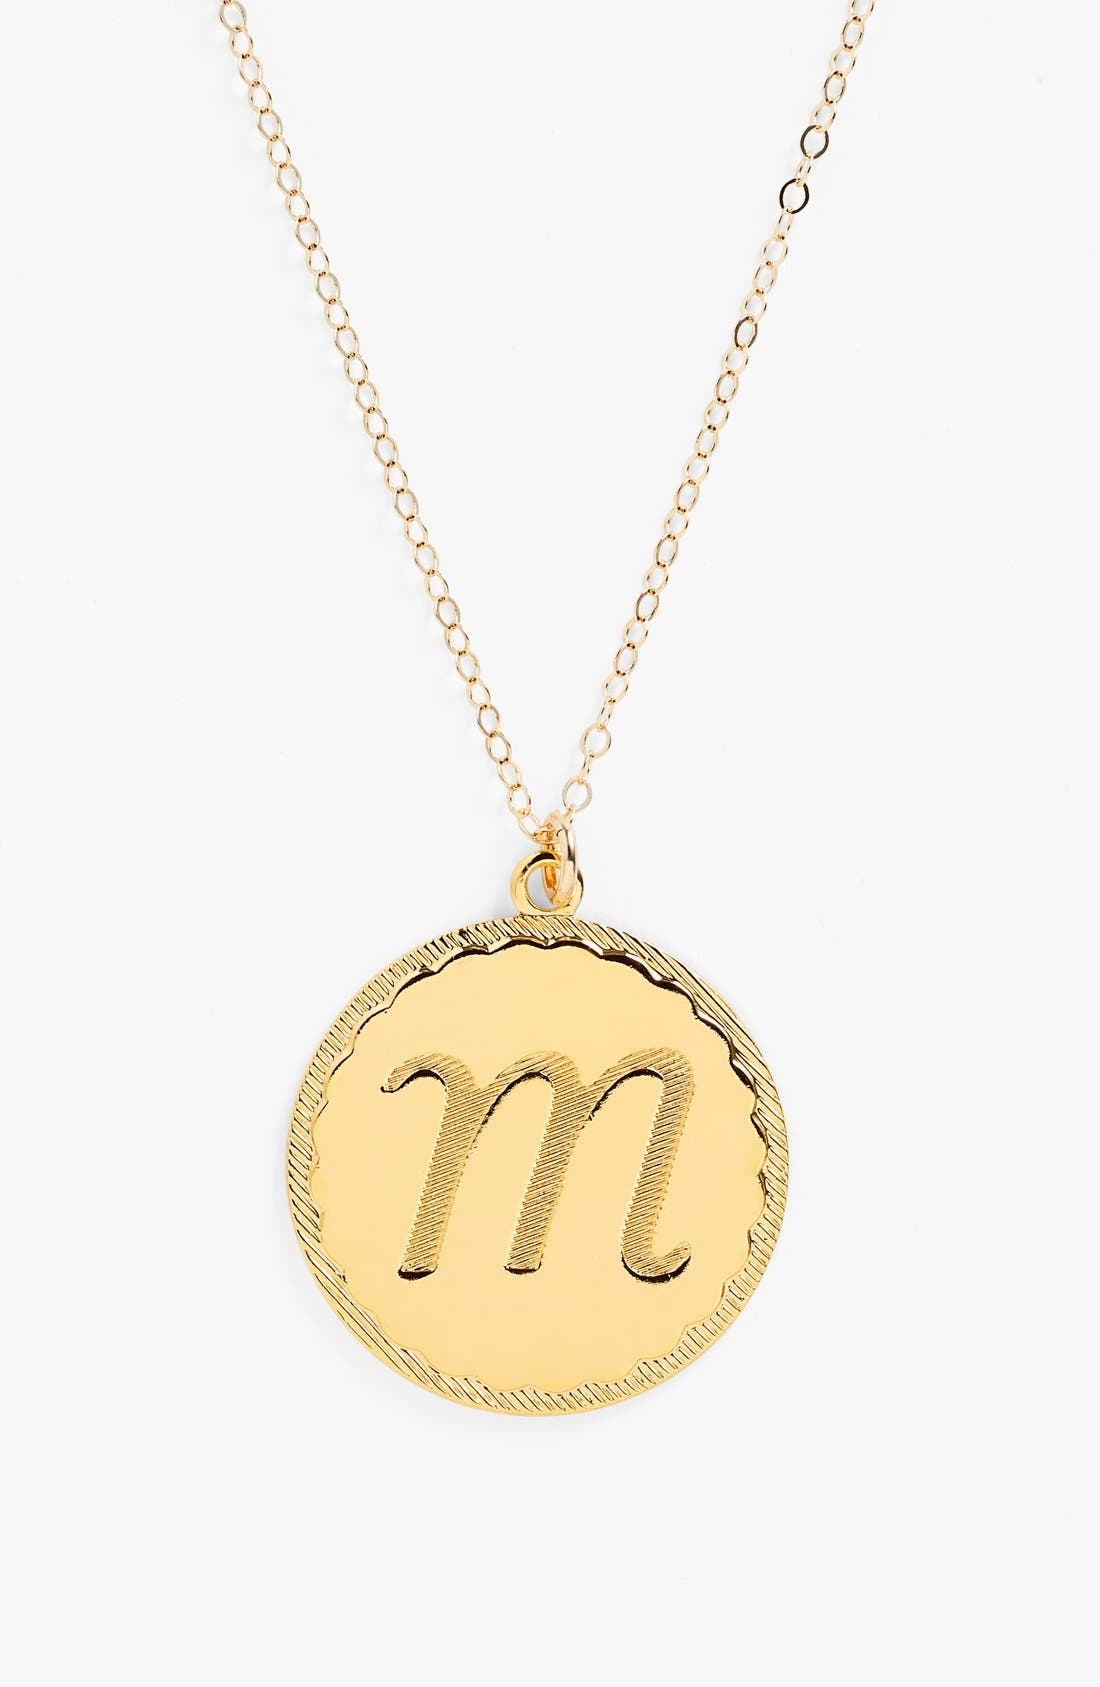 Moon and Lola 'Dalton' Long Initial Pendant Necklace